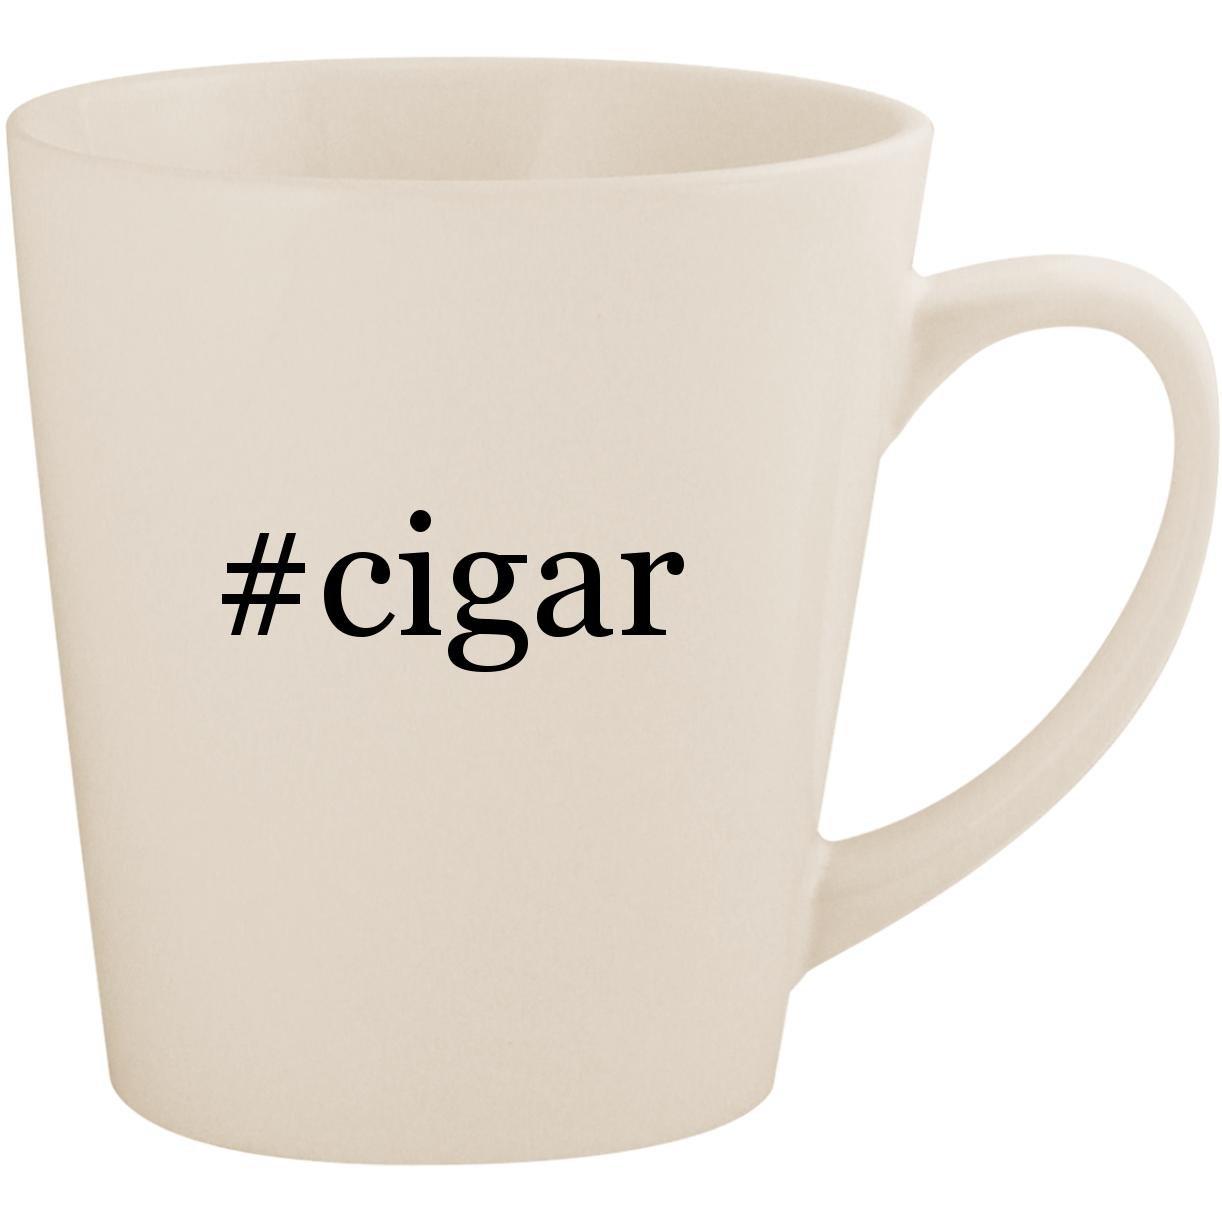 # Cigar – ホワイトハッシュタグ12oz Ceramic Latte Mug Cup B0742PCJ4G